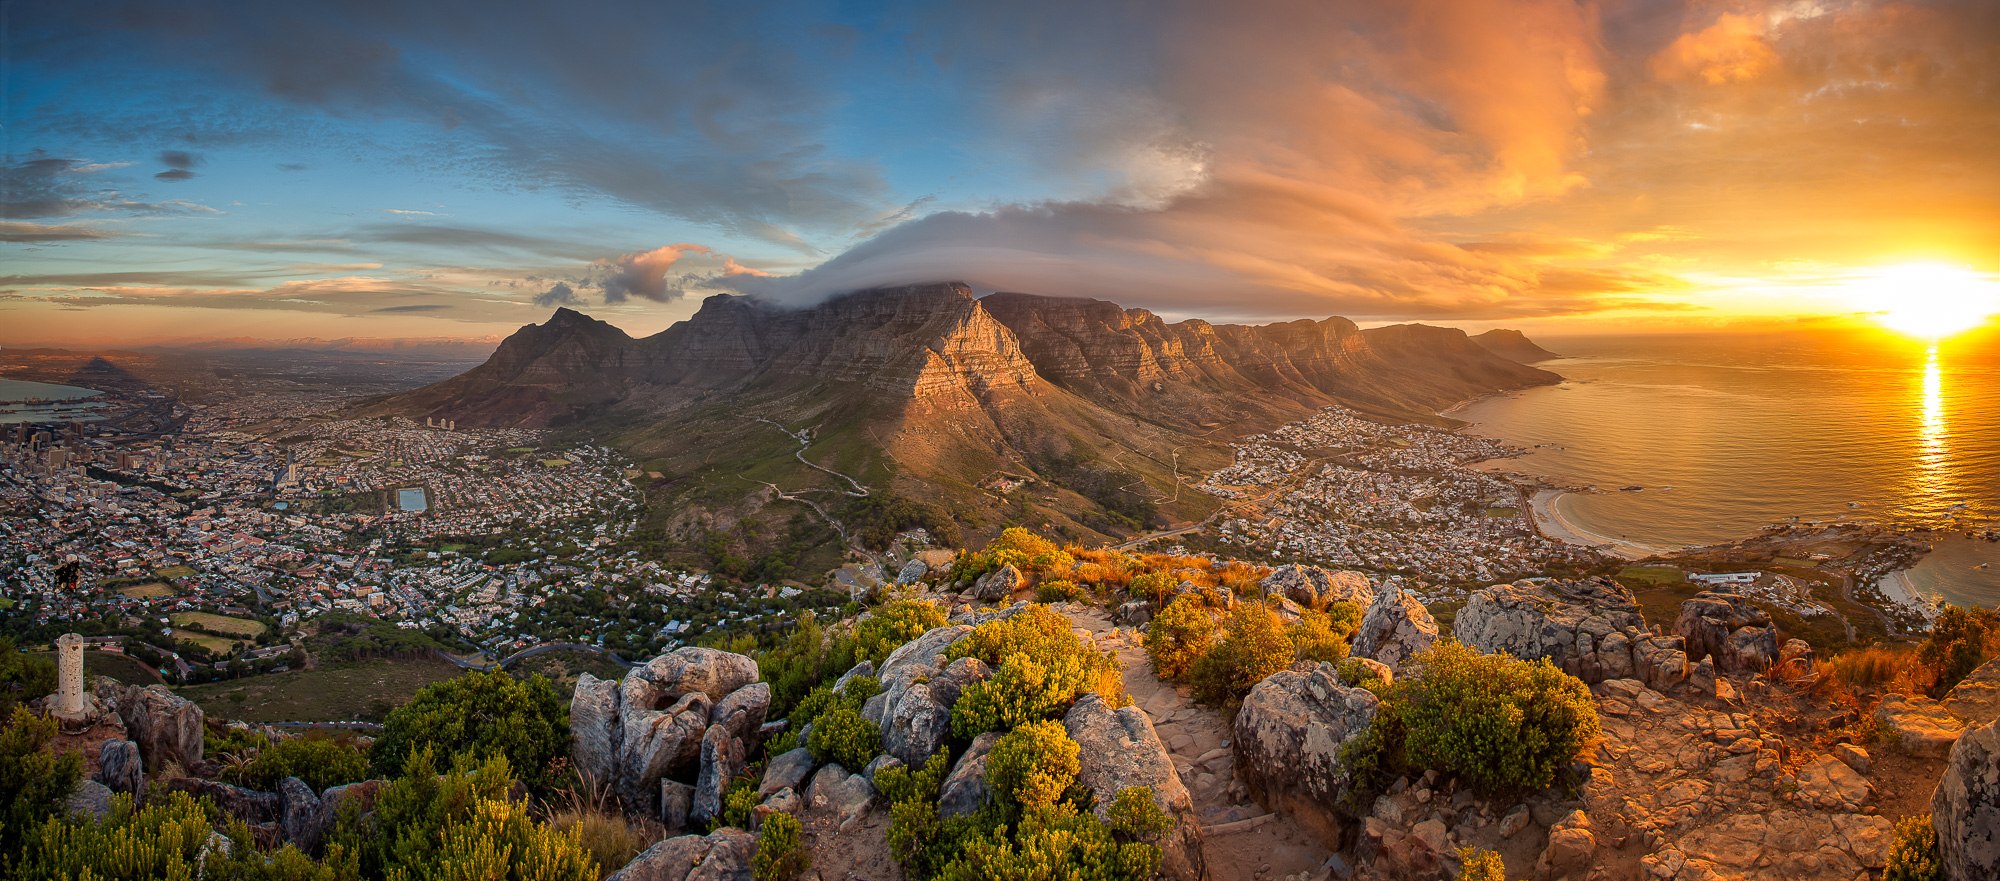 201701_South Africa_Stuart McMillan Photography_313.jpg